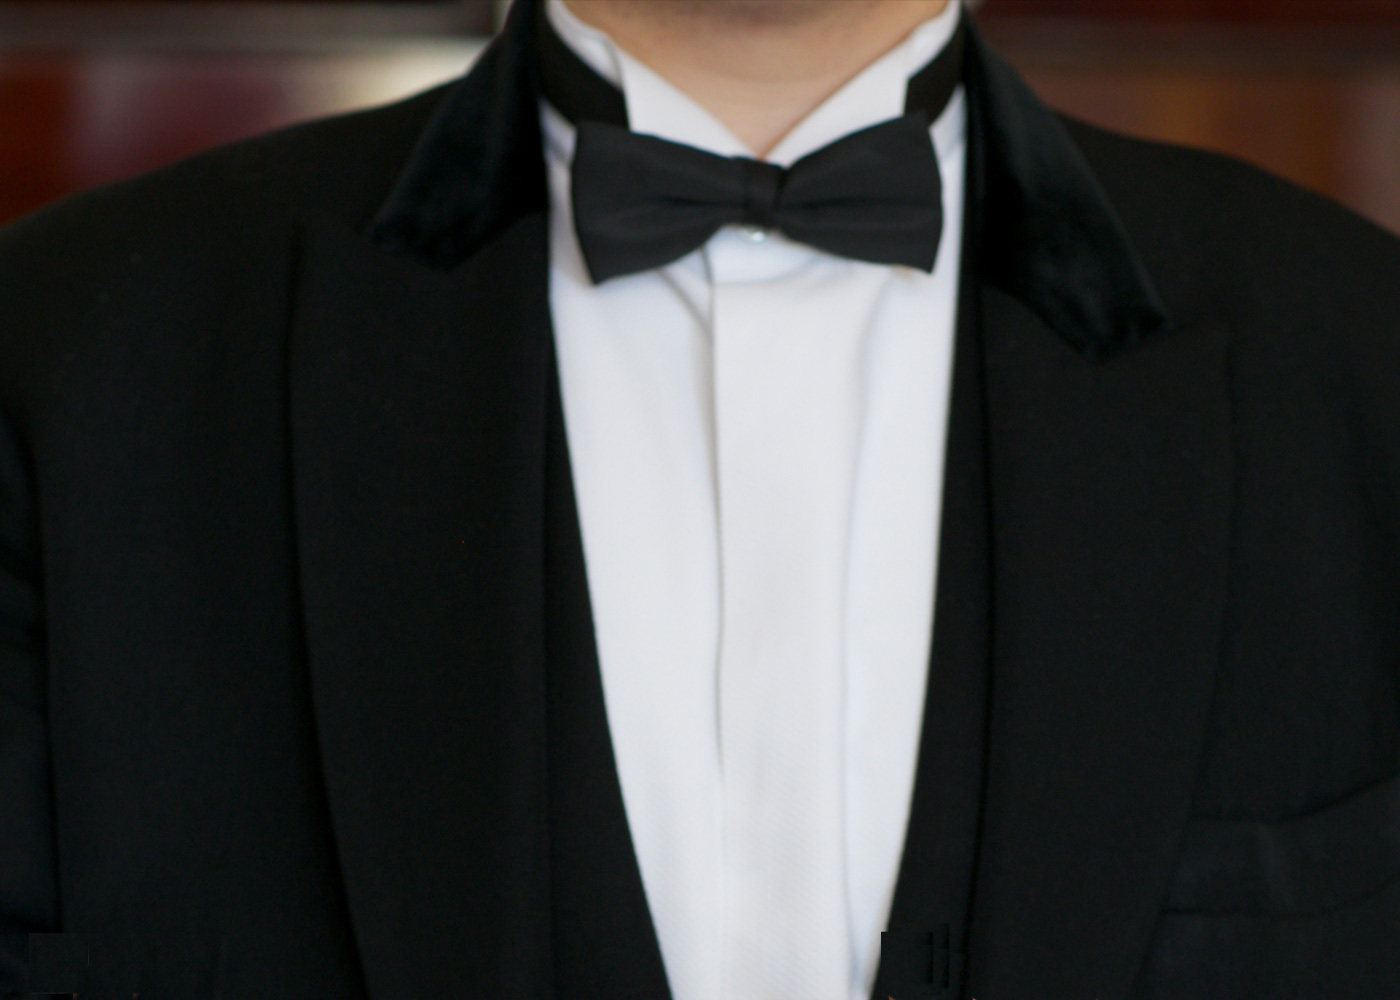 The Ritz Dress Code